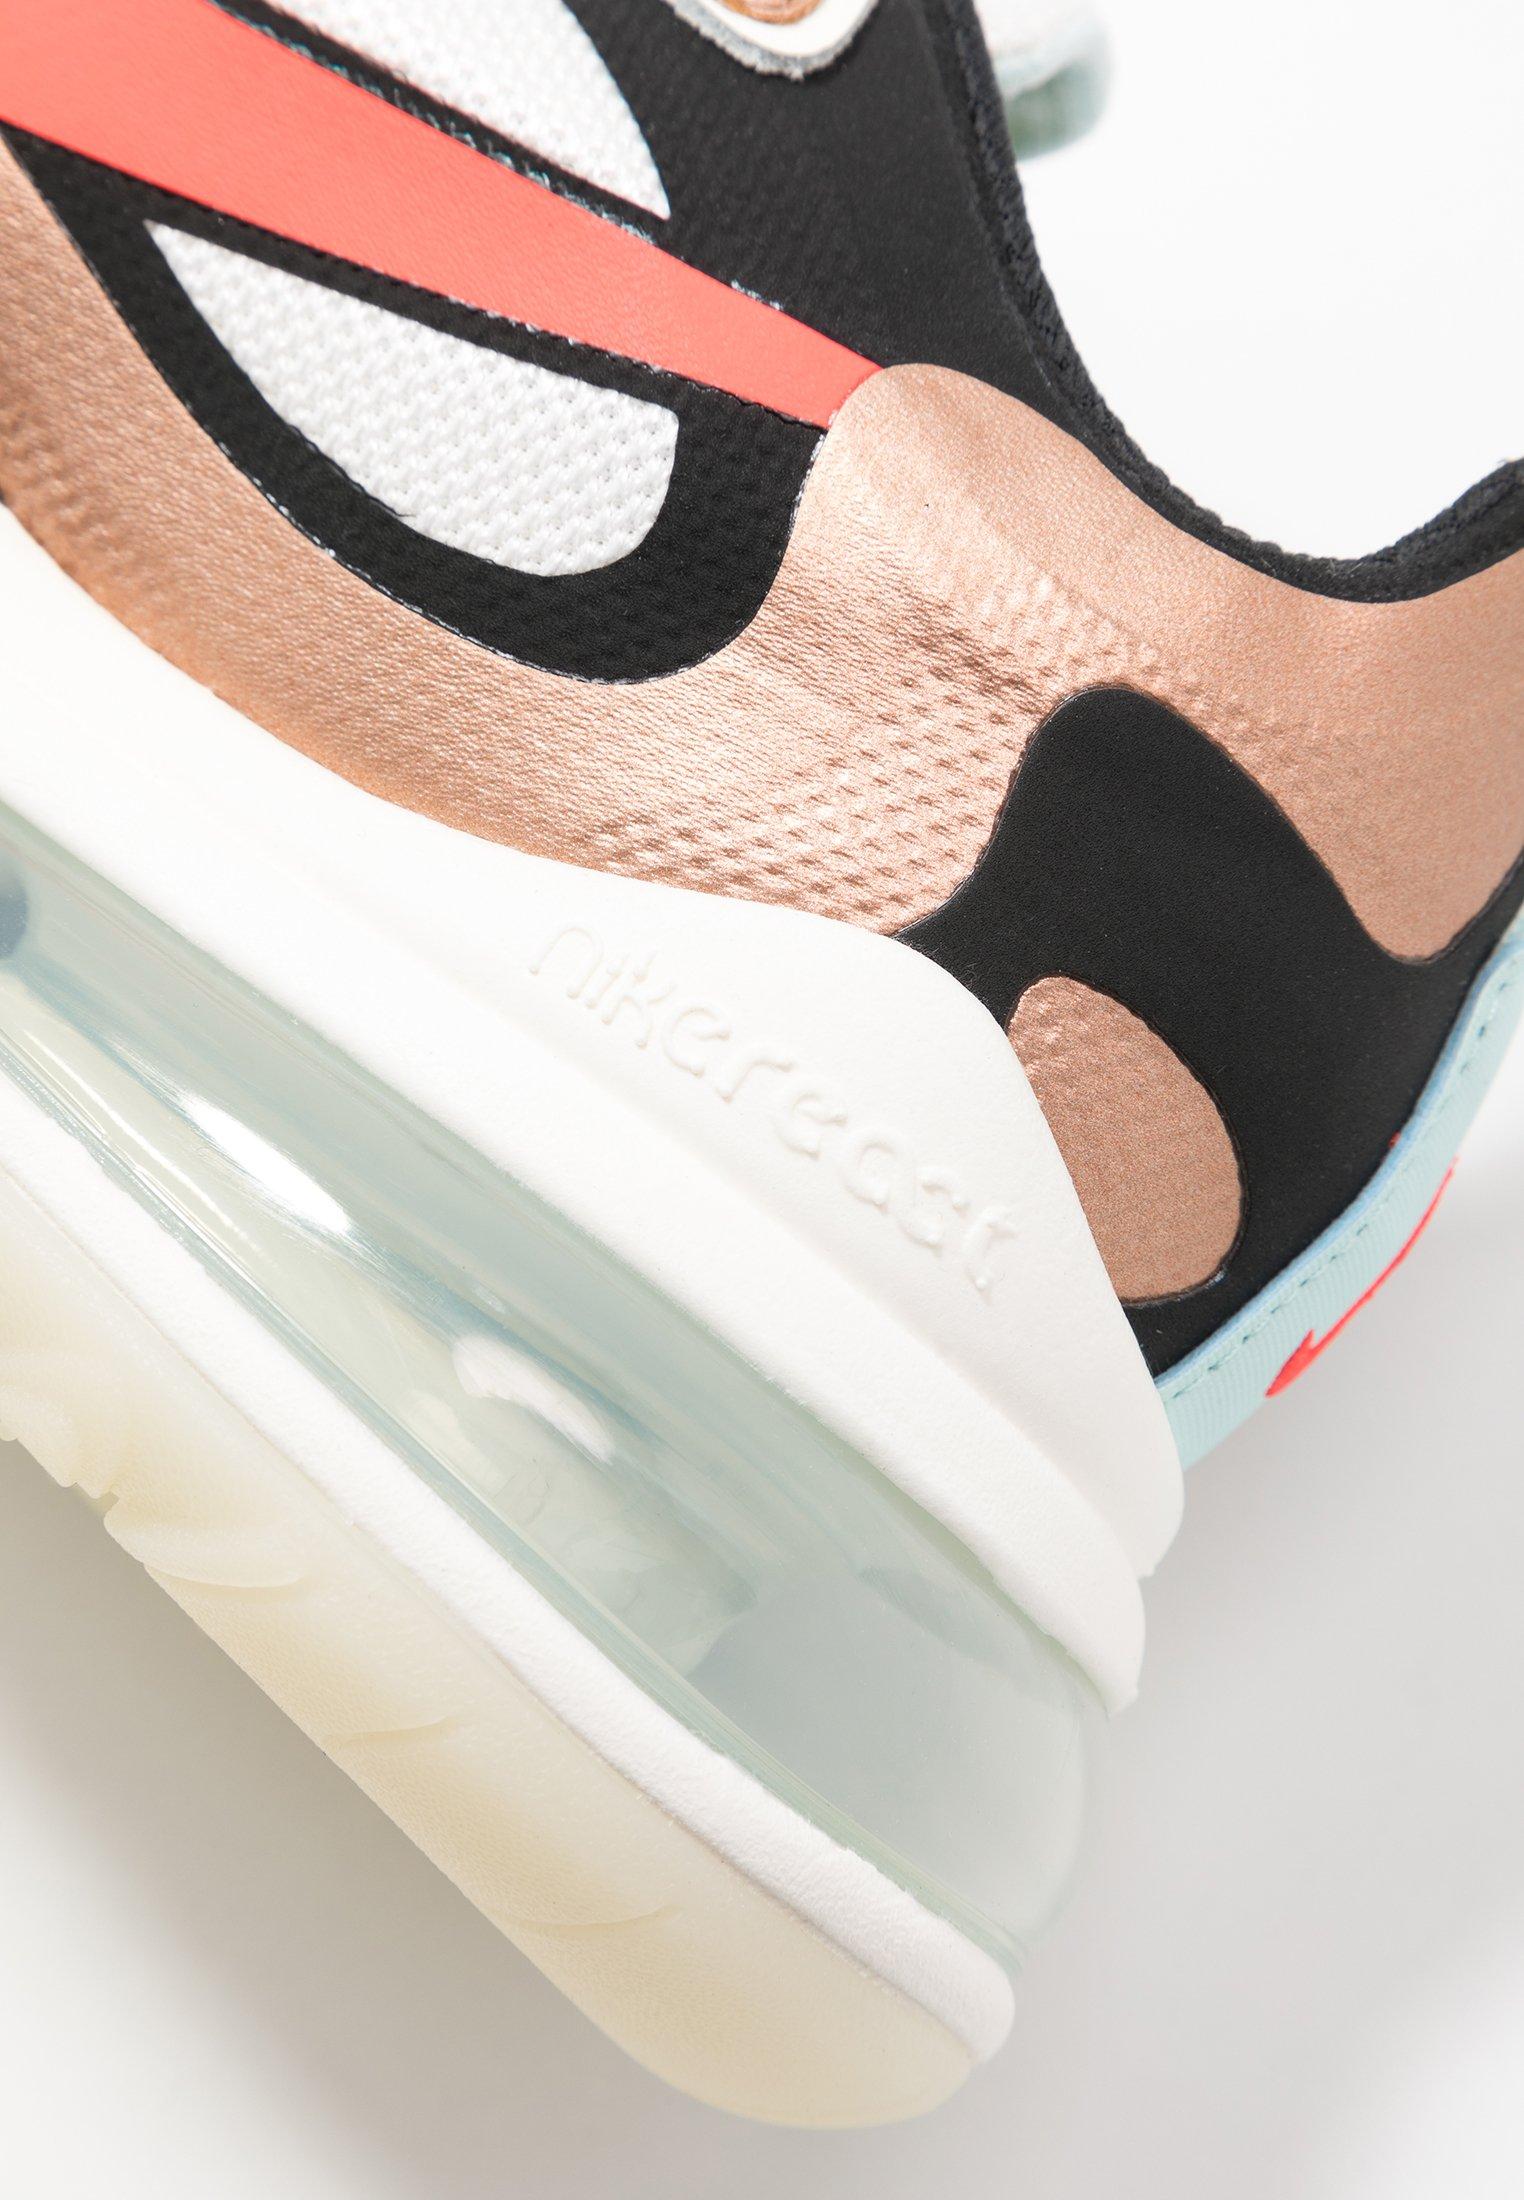 AIR MAX 270 REACT Sneakers basse sailblack metallicred bronzepure platinumteal tintbright crimson